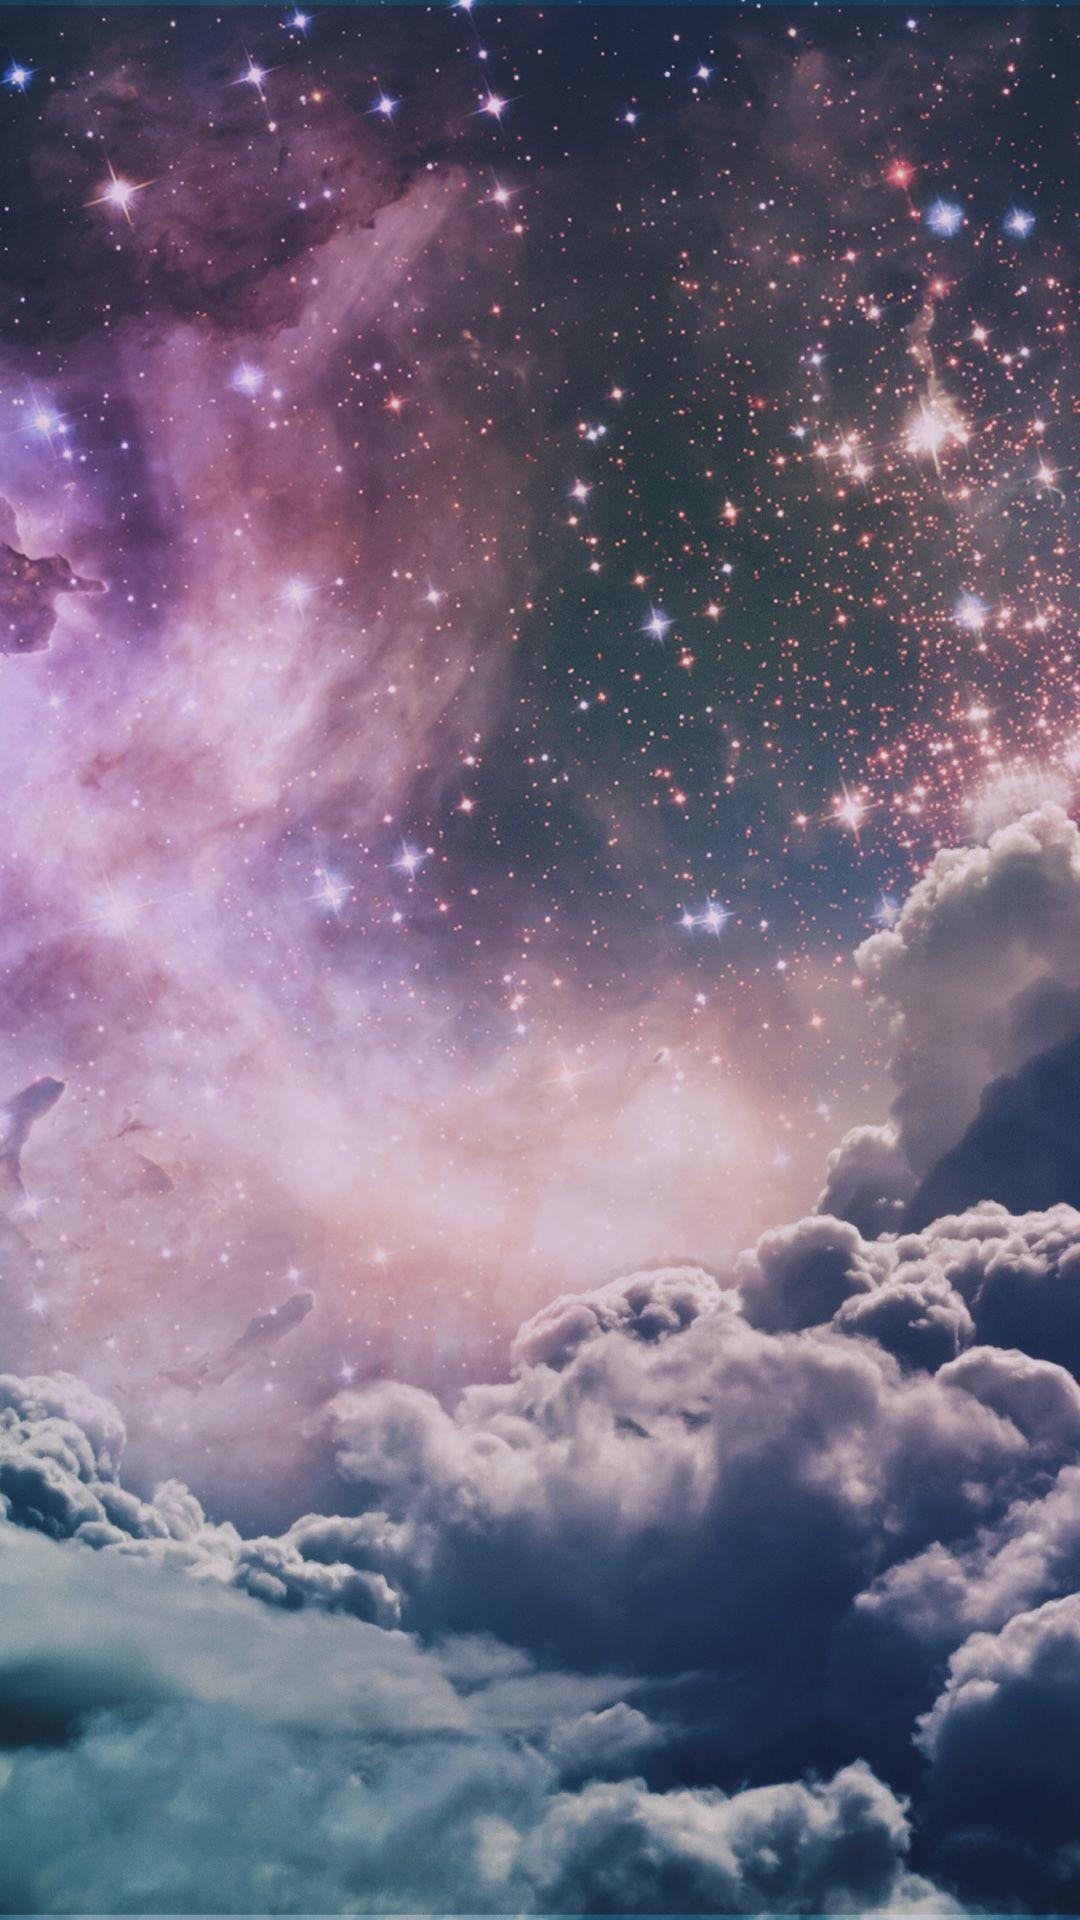 Magic Space Wallpaper Galaxy Phone Wallpaper Cute Galaxy Wallpaper Galaxy Wallpaper Iphone